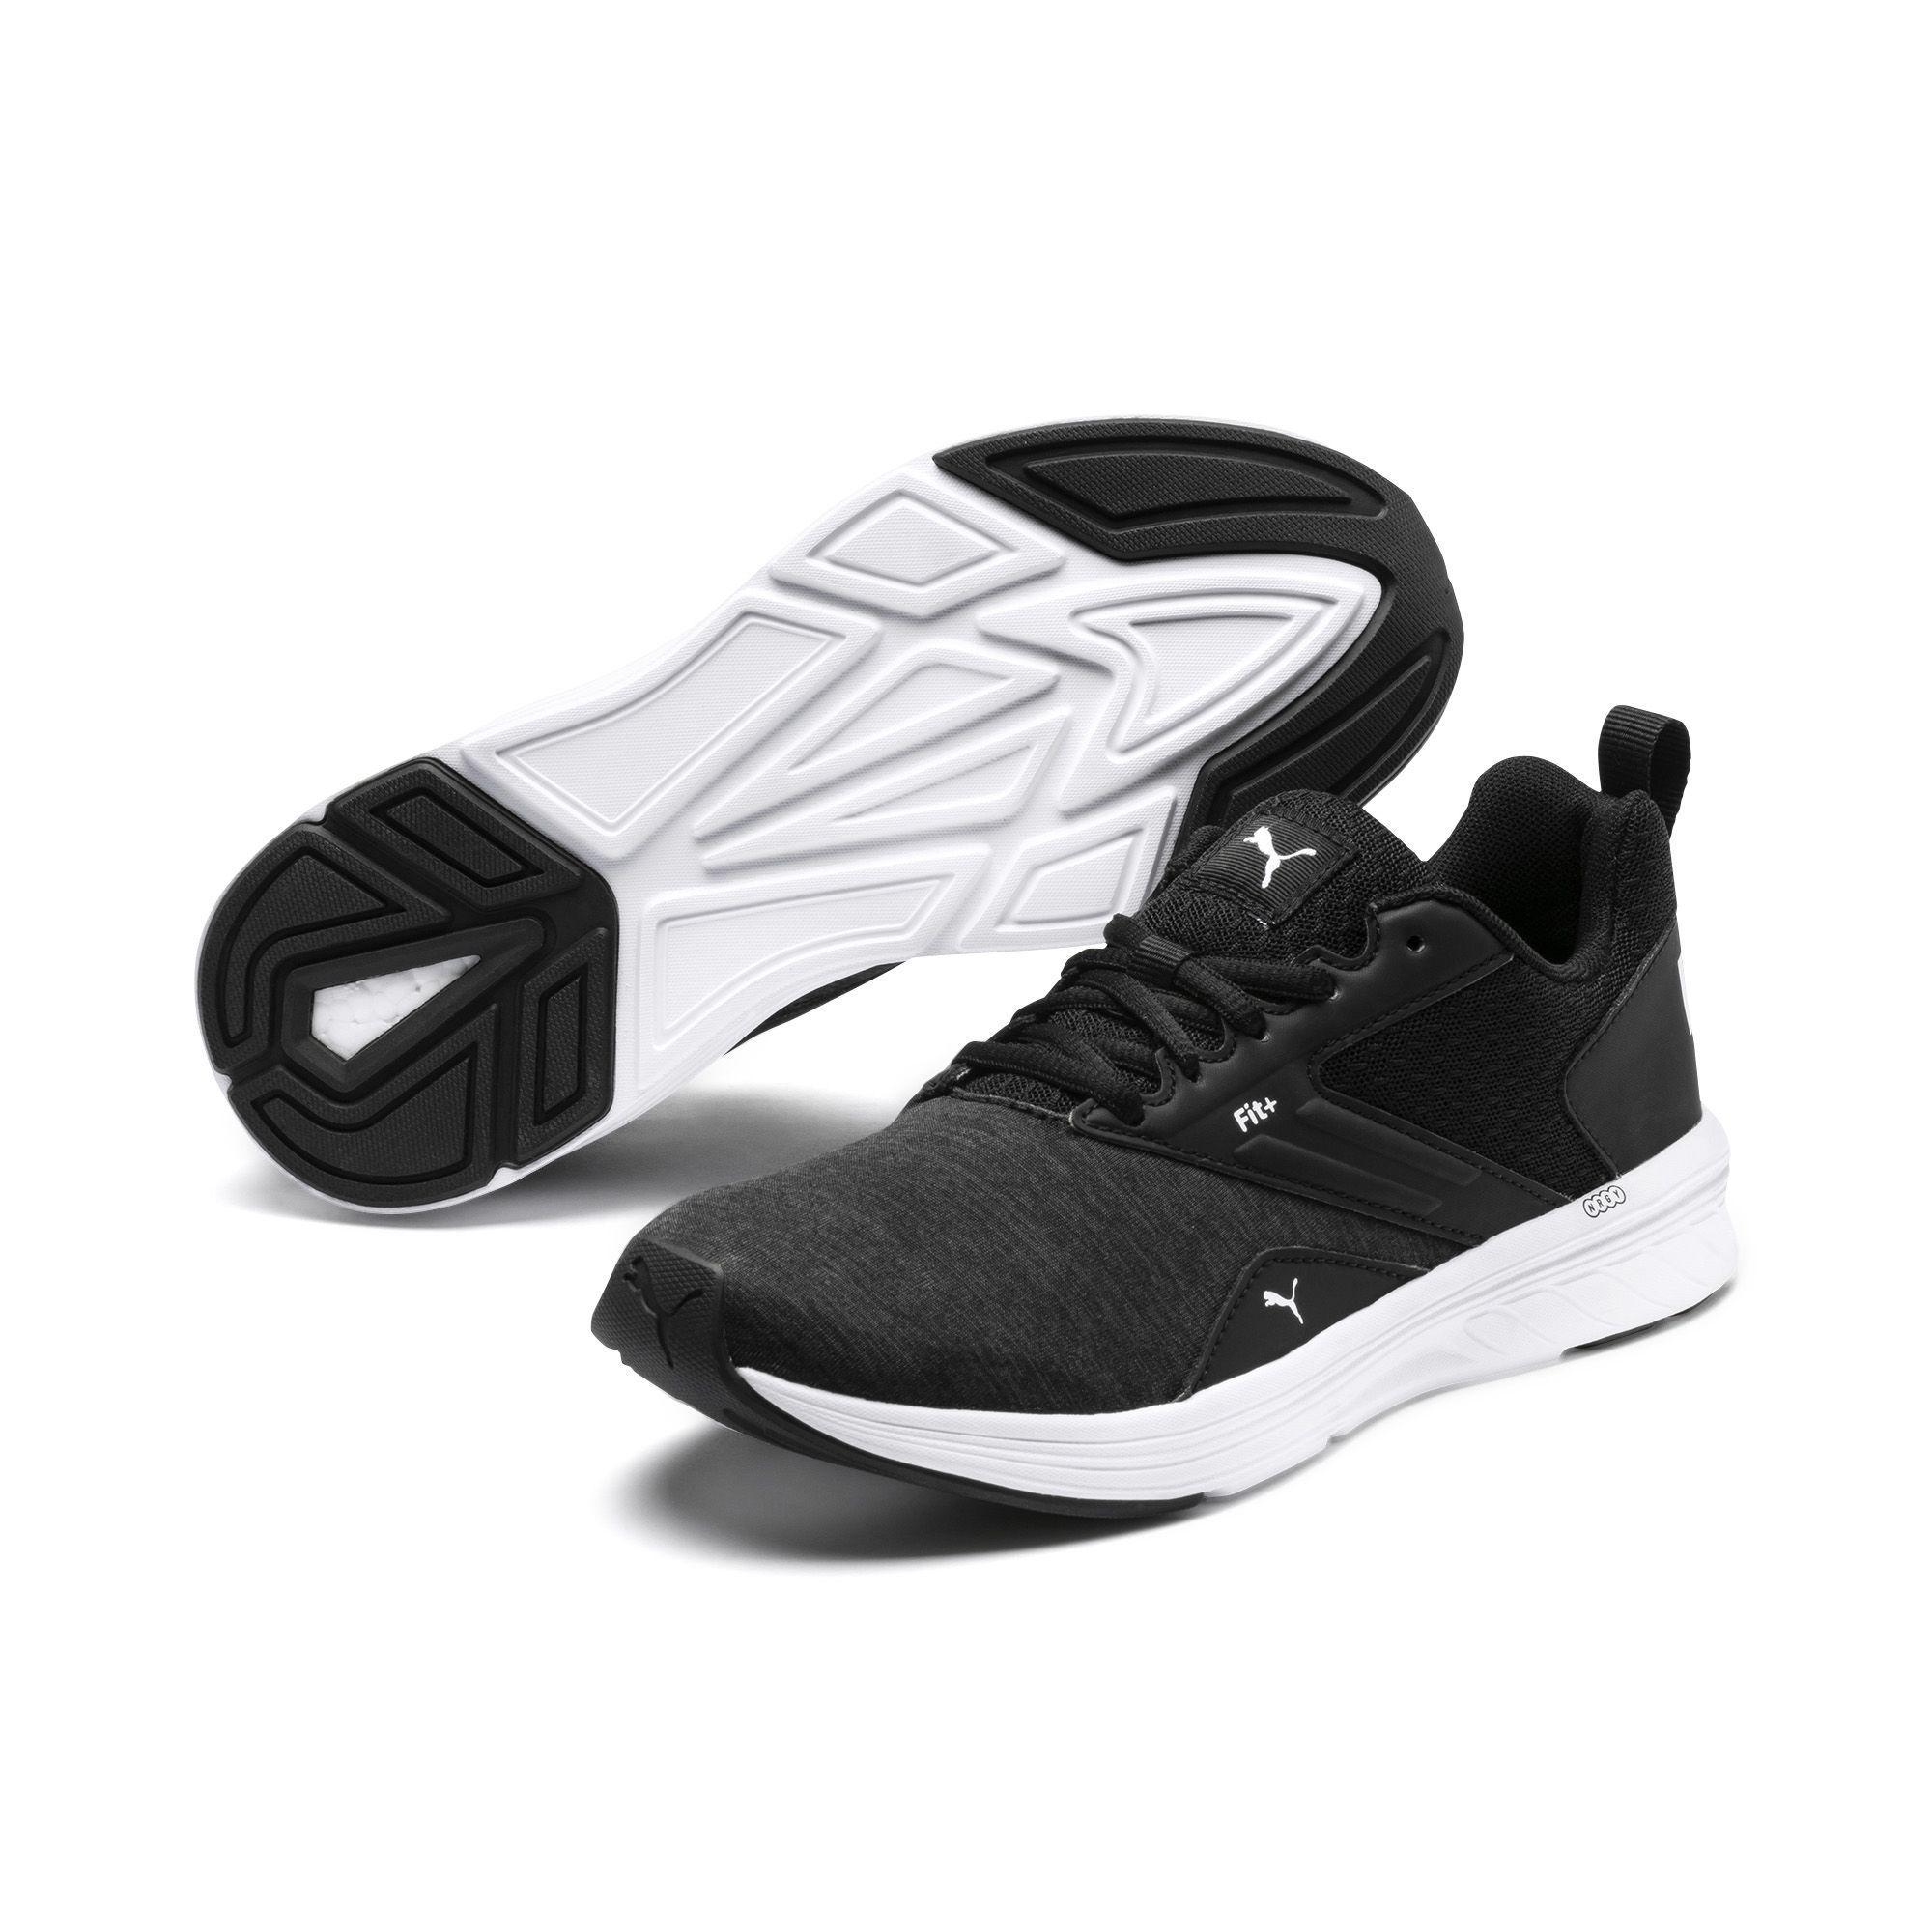 PUMA - Black Nrgy Comet Running Shoes for Men - Lyst. View fullscreen 2c44331bd